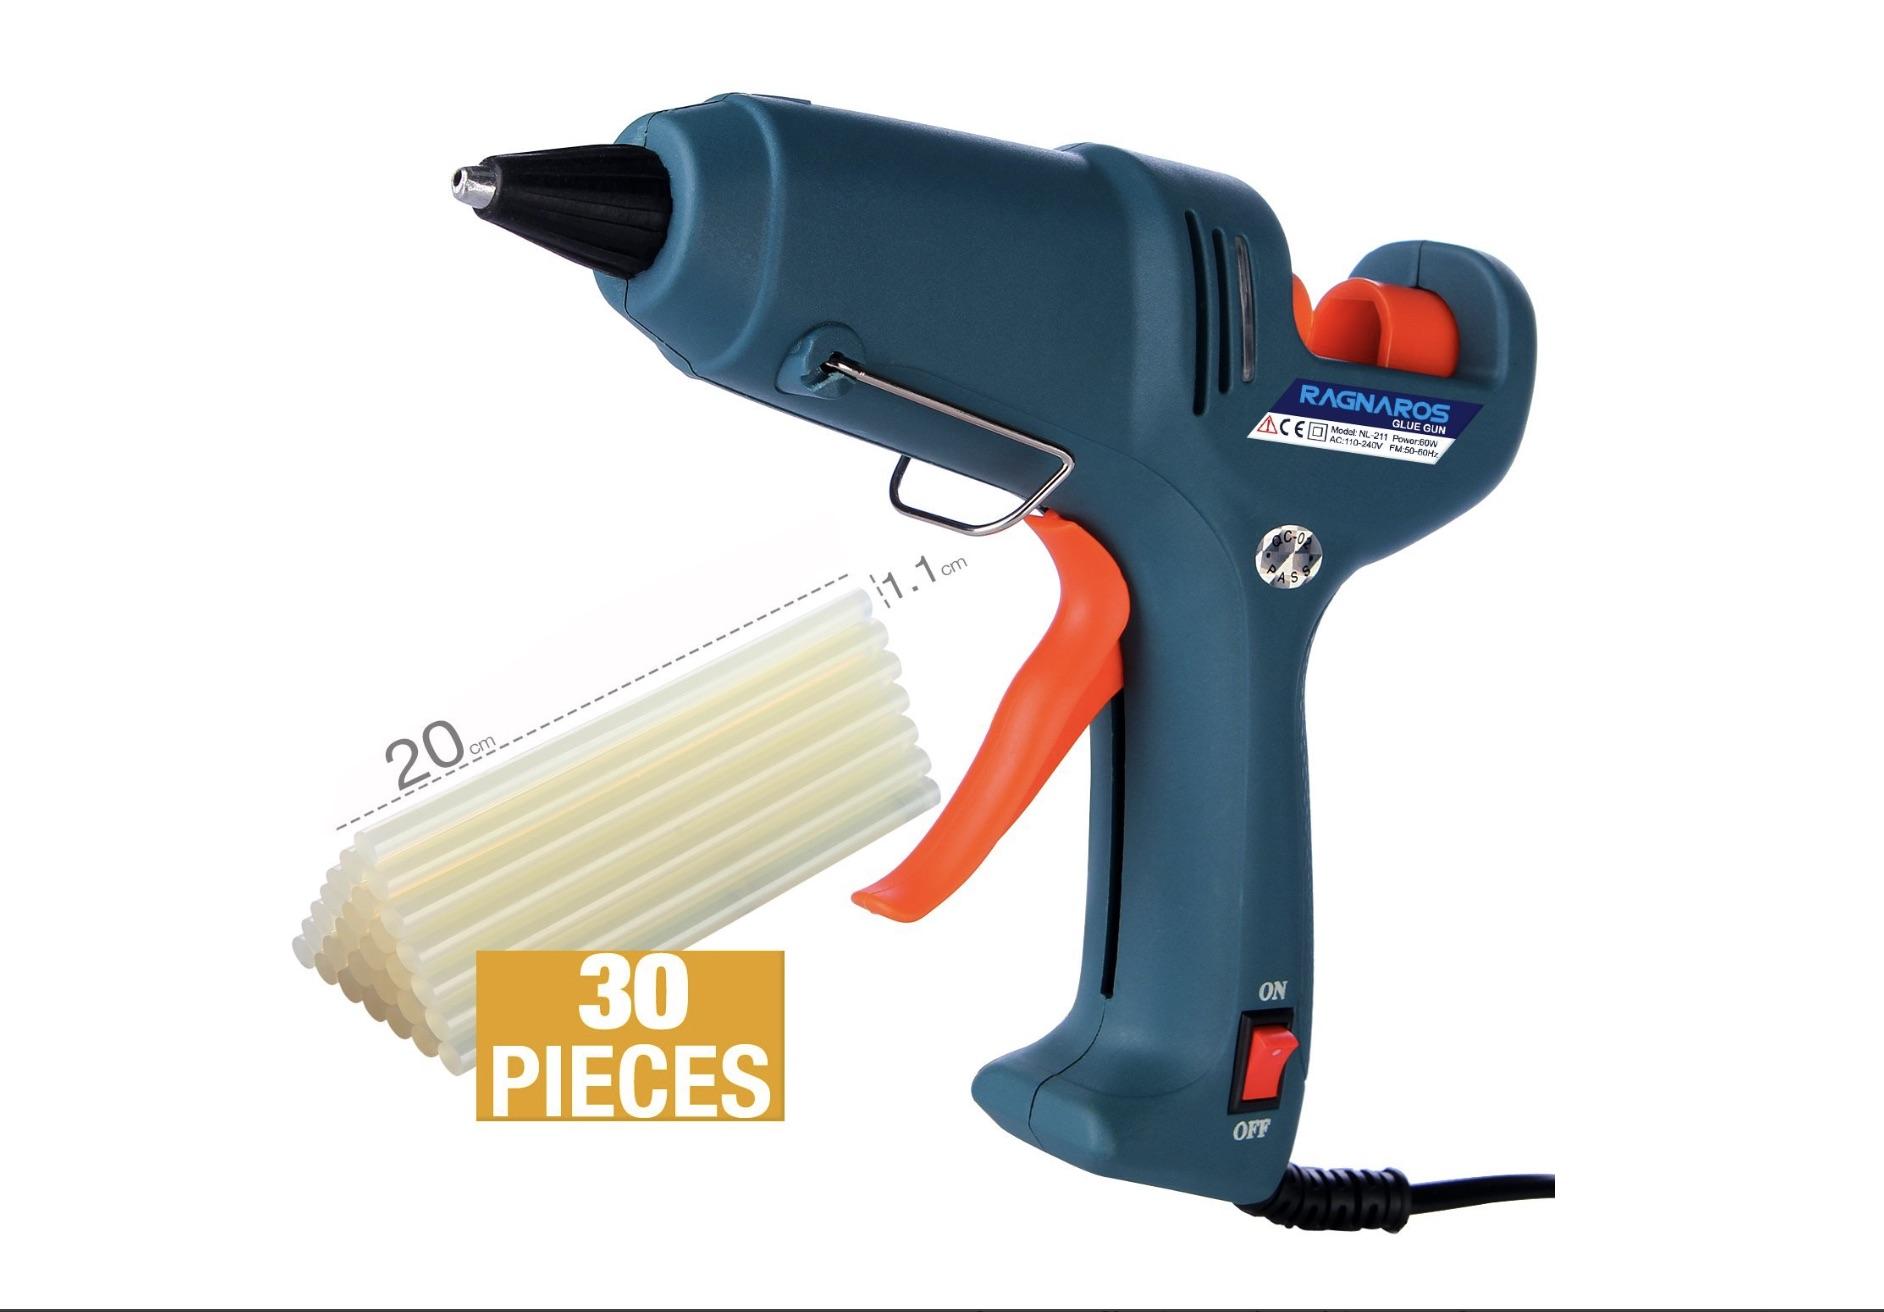 Hot glue gun kit with glue sticks $14.39